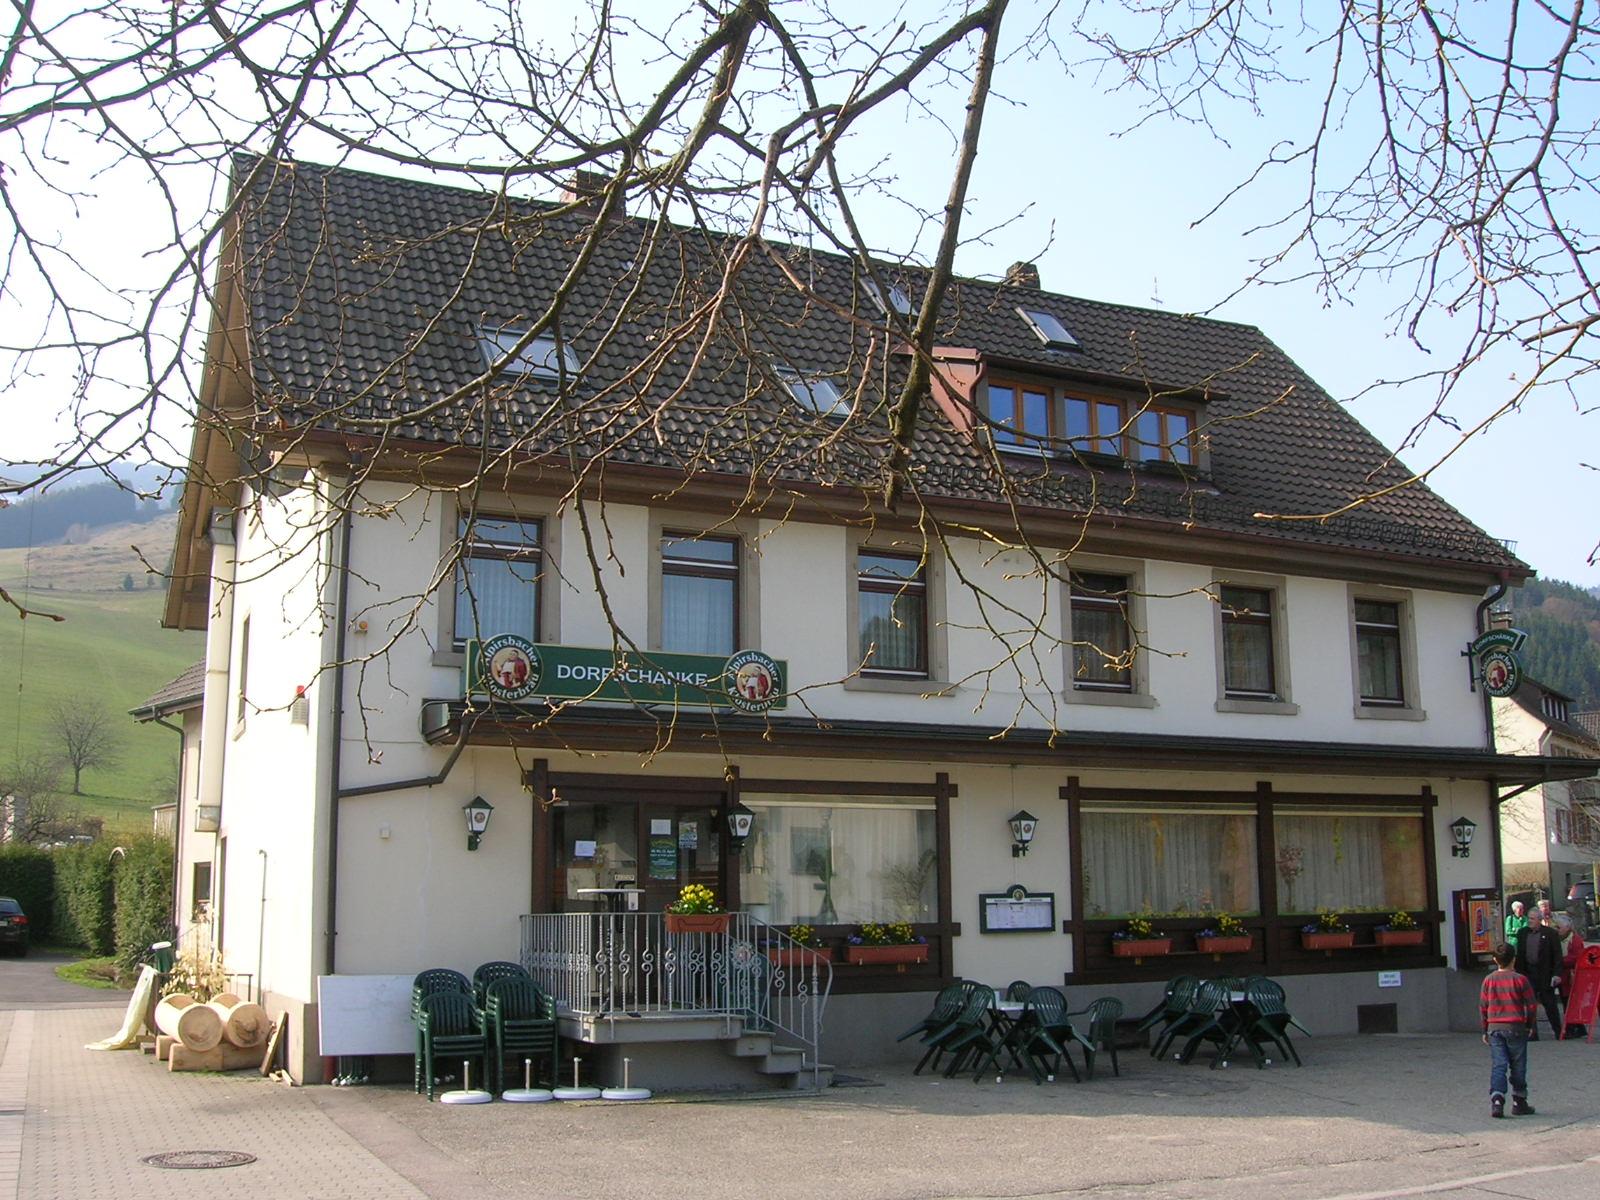 File:Oberried Dorfschänke.JPG - Wikimedia Commons